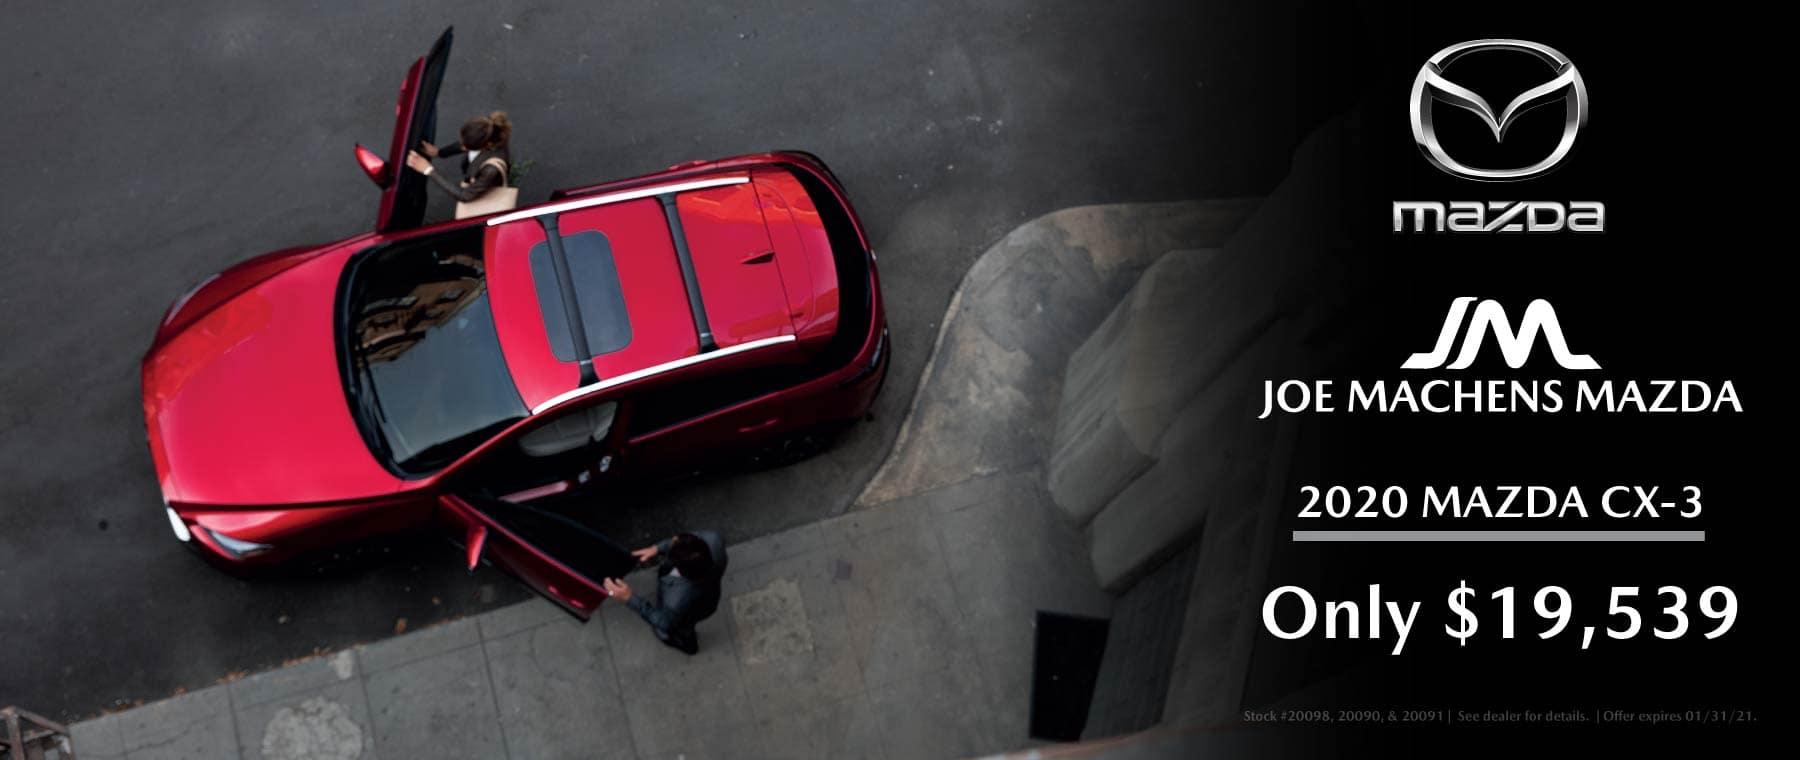 Machens-Mazda-Incentives-01-21_CX-3-Slider (1)